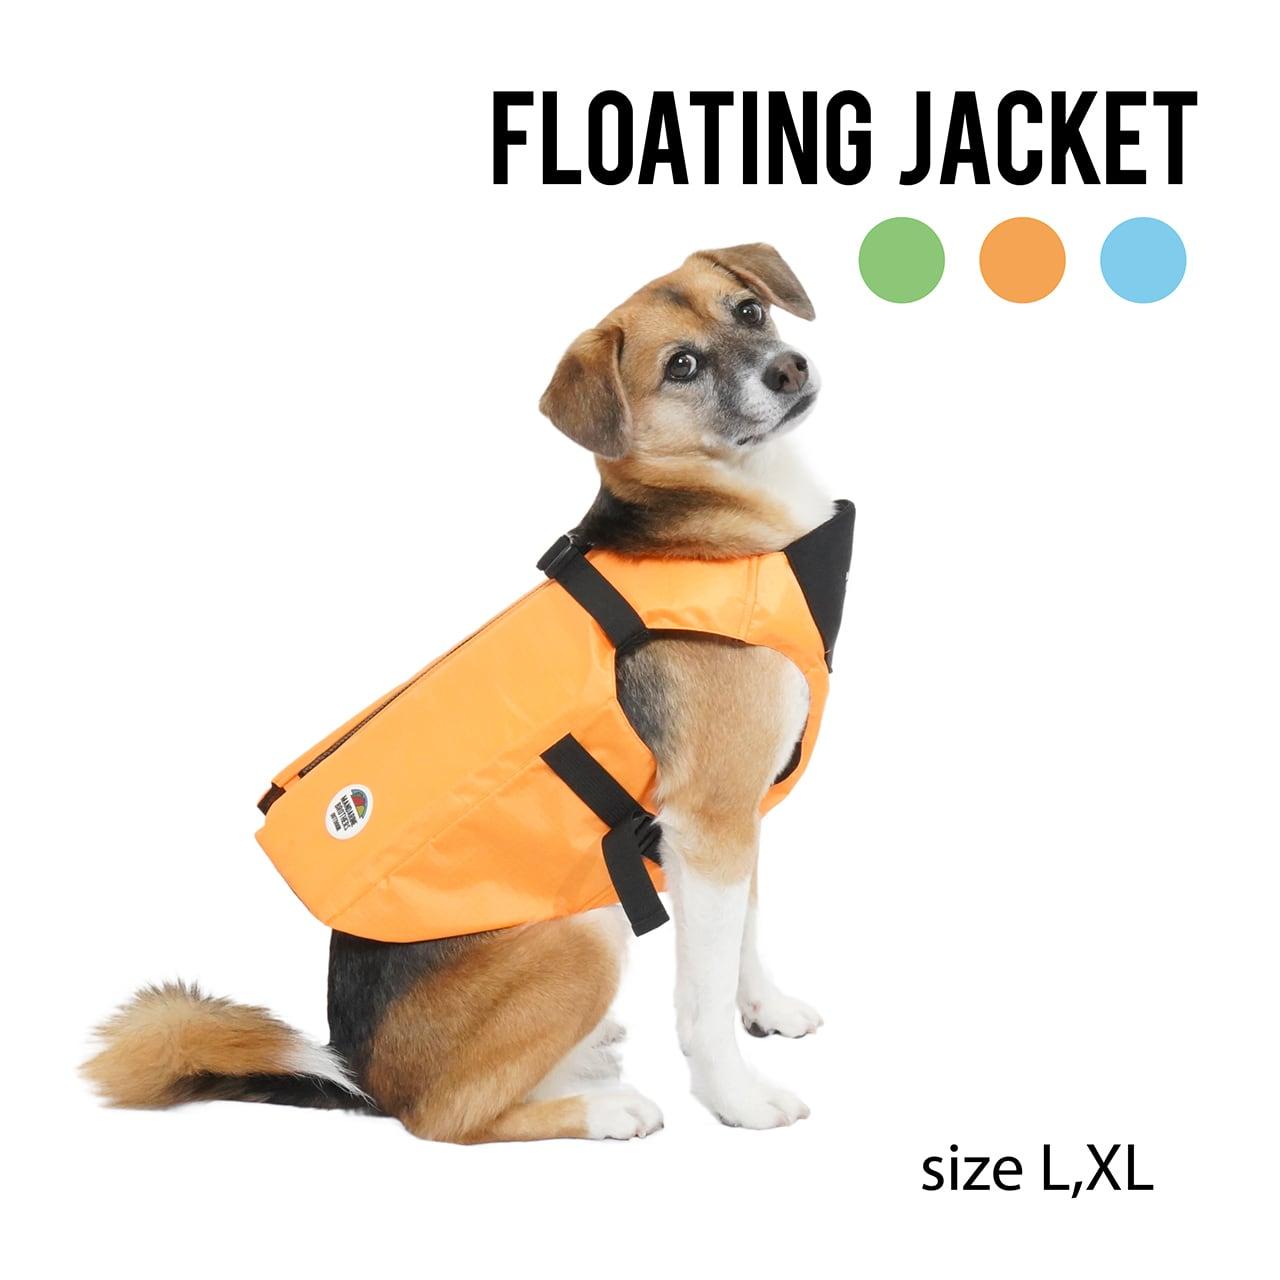 FLOATING JACKET(L,XL) フローティングジャケット